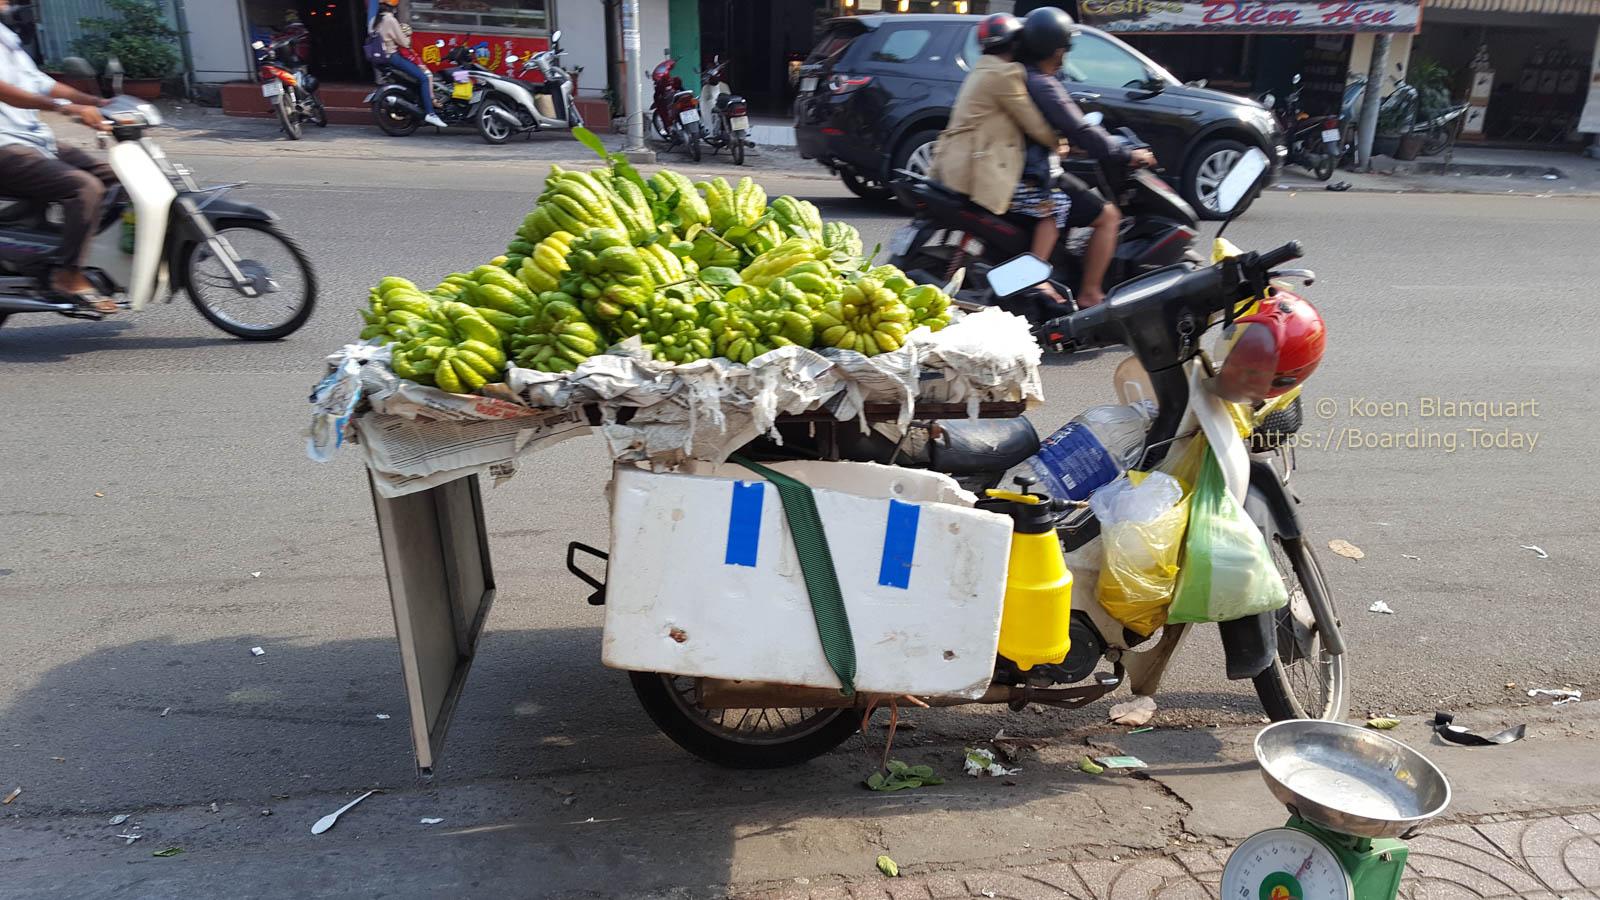 20170122-2017-01-22 14.45.48Ho Chi Minh City, Saigon, Vietnam by Koen Blanquart for Boarding.Today.jpg